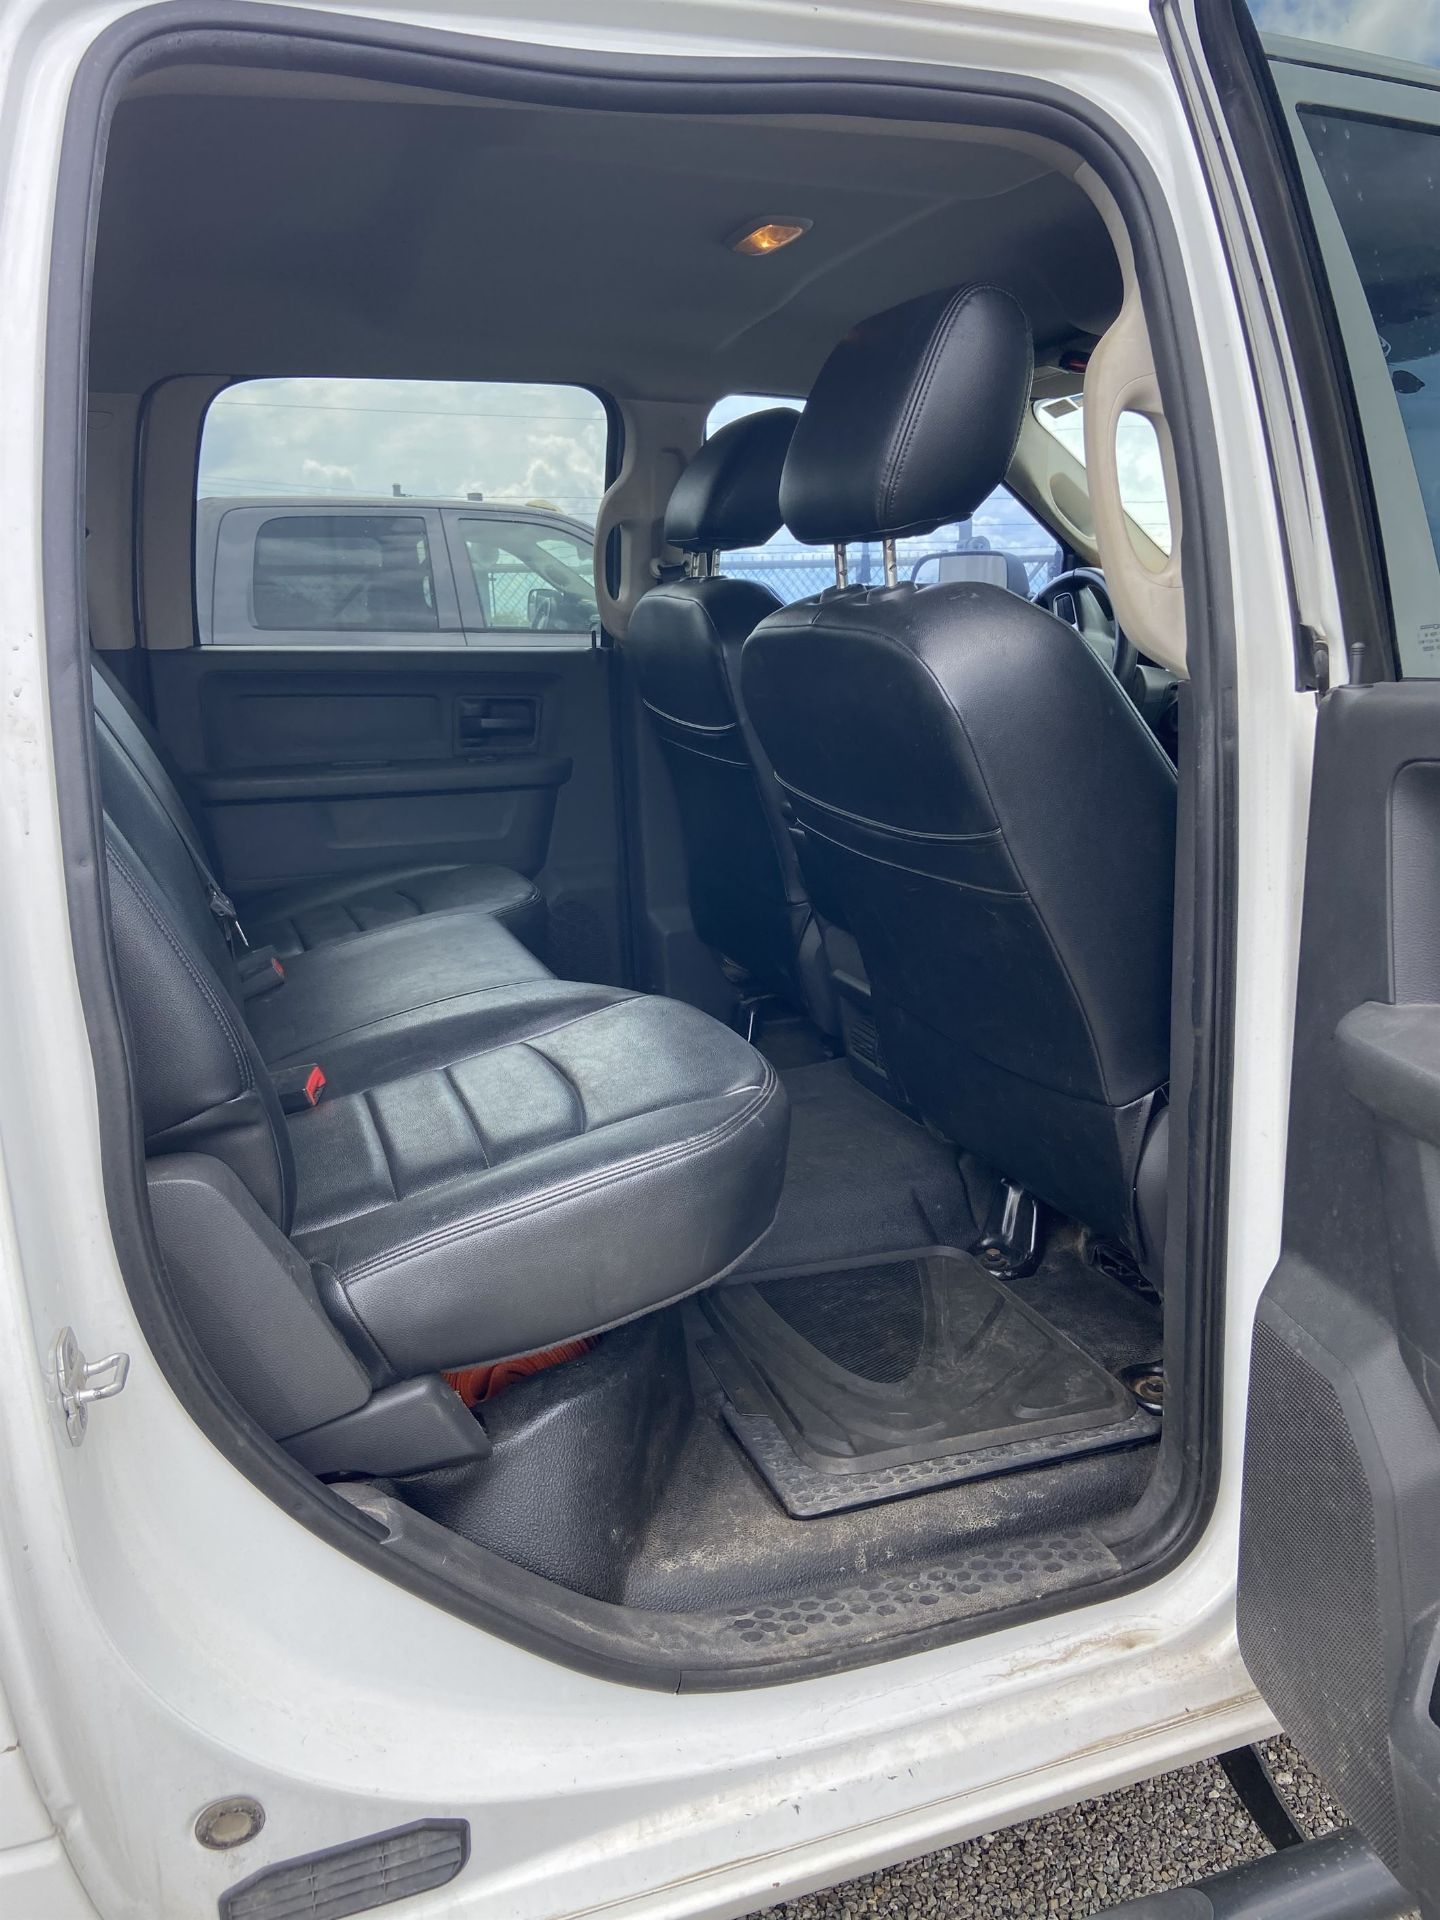 2011 Dodge Ram 2500 HD Crew Cab Long Bed, 212k Miles, Vinyl, 4x4, Gas, VIN # 3D7TT2CT9BG626009 - Image 13 of 16